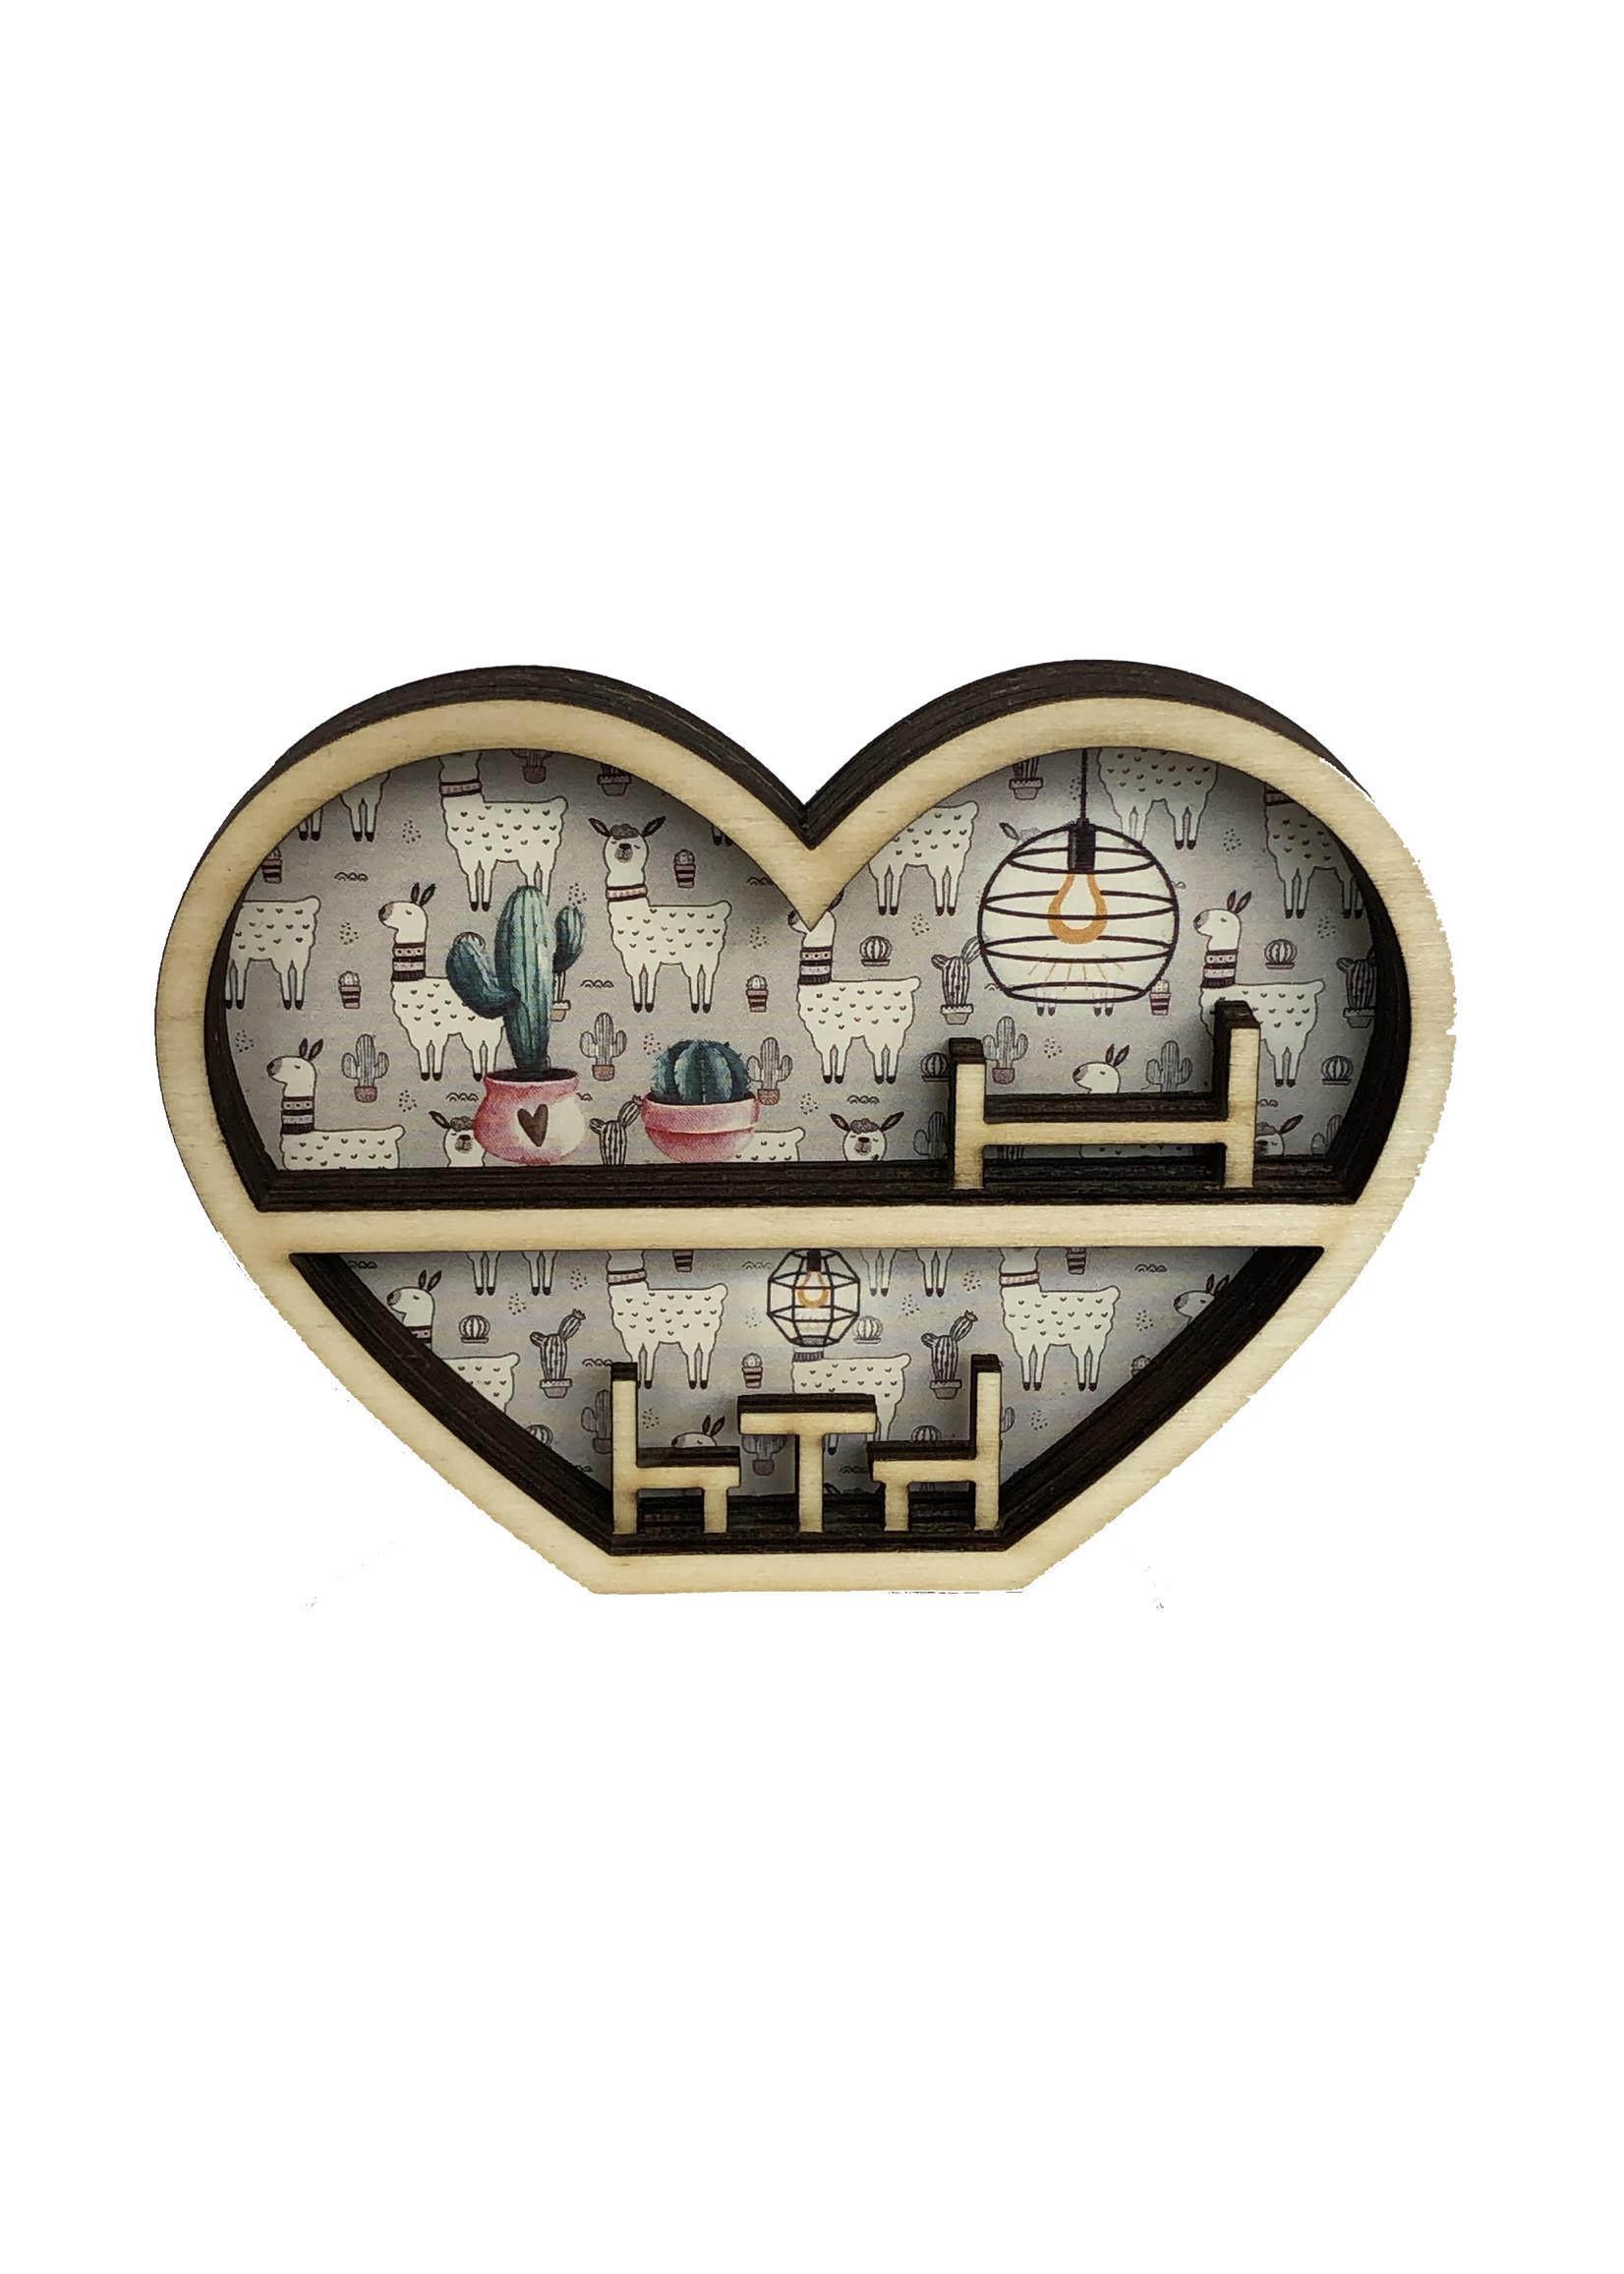 Mini poppenhuisje in hart vorm in lama thema